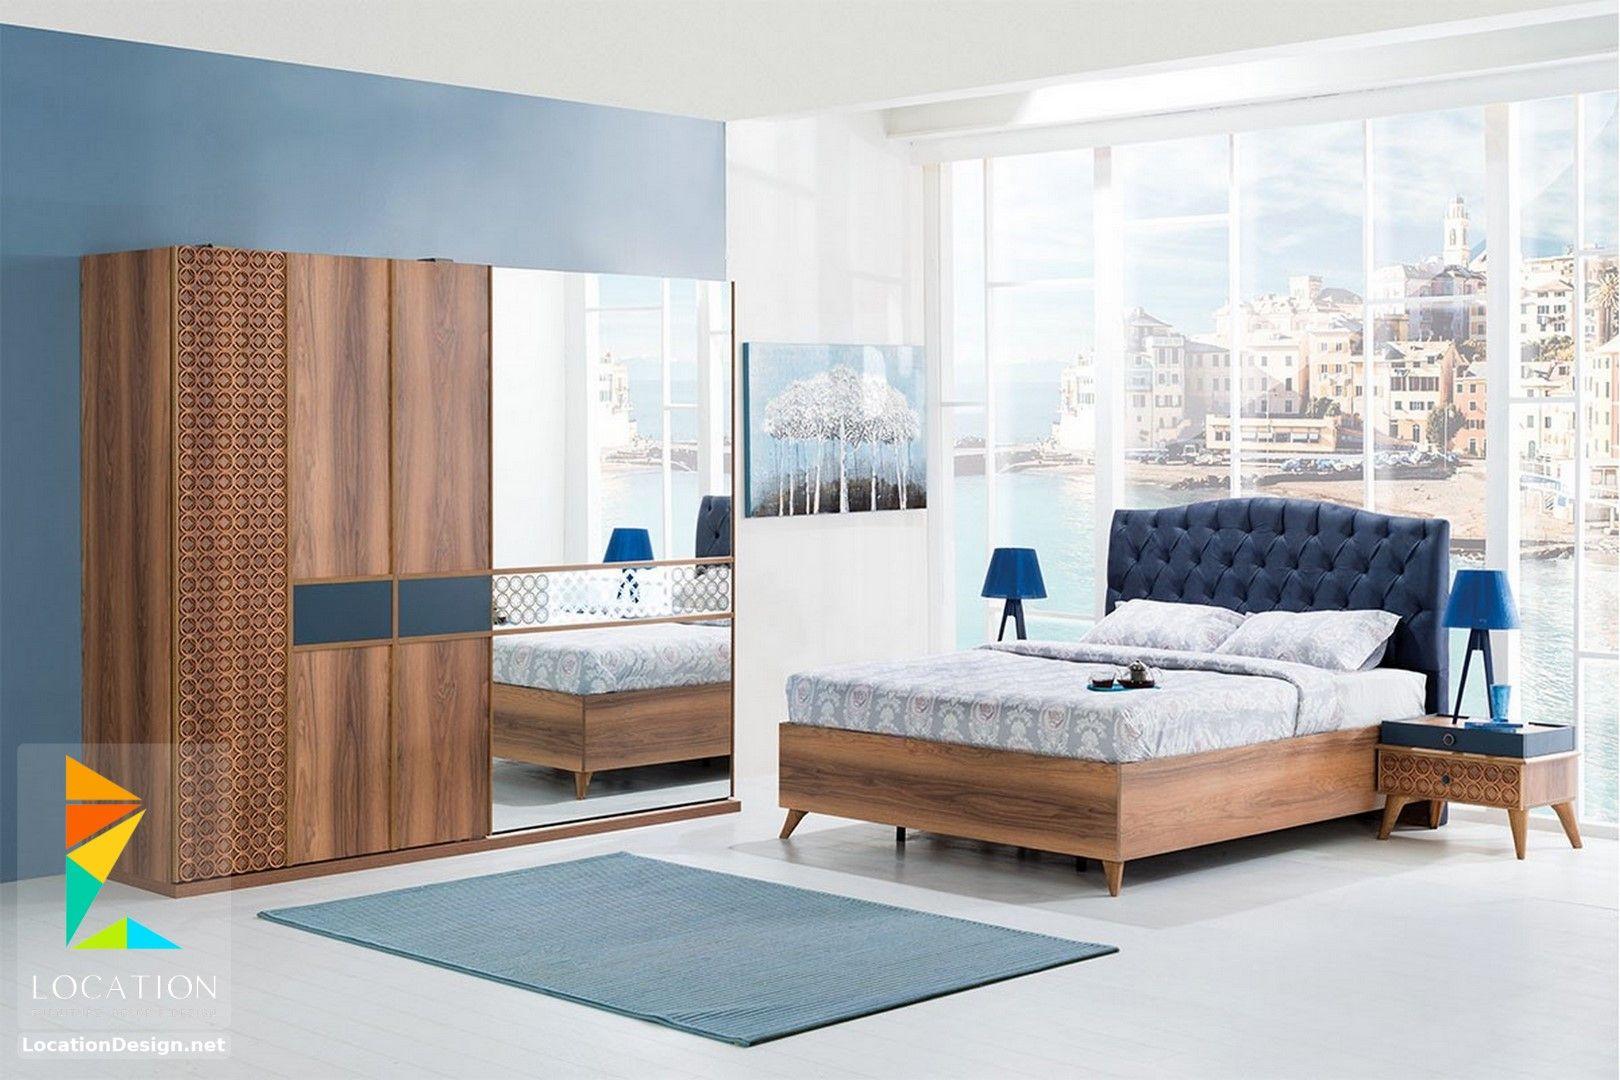 احدث موديلات و اشكال غرف نوم تركي 2019 2020 Furniture Sleeping Room Furniture Decor